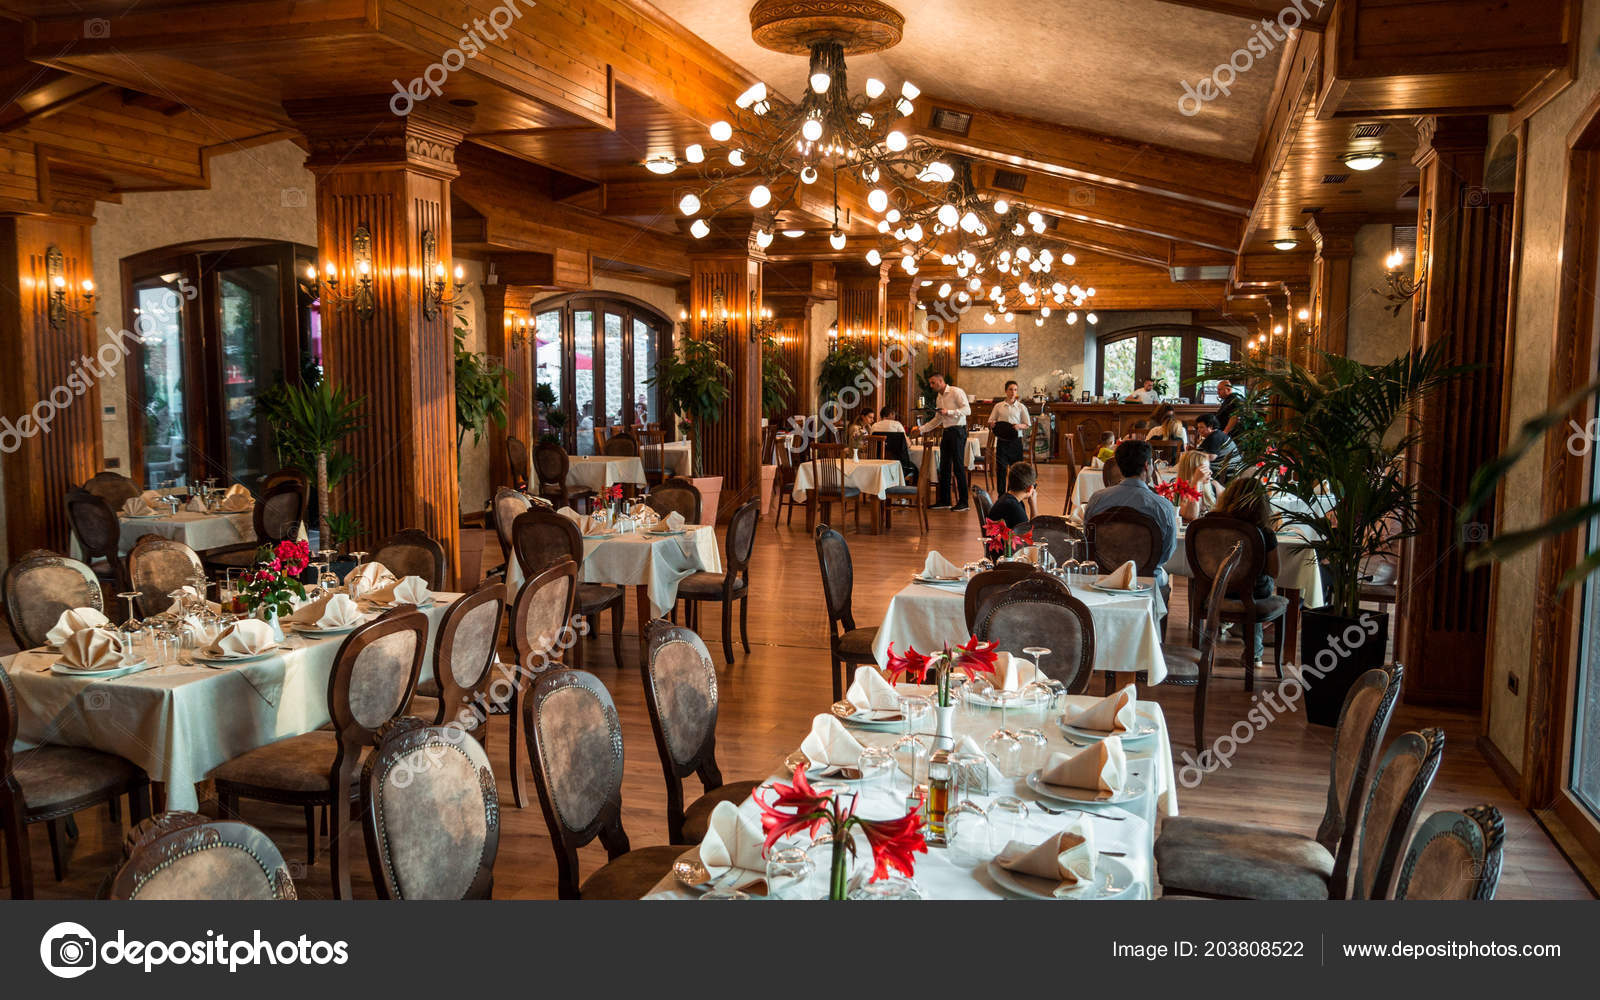 kruje albania sunday may 2018 restaurant interior dinner time rh depositphotos com